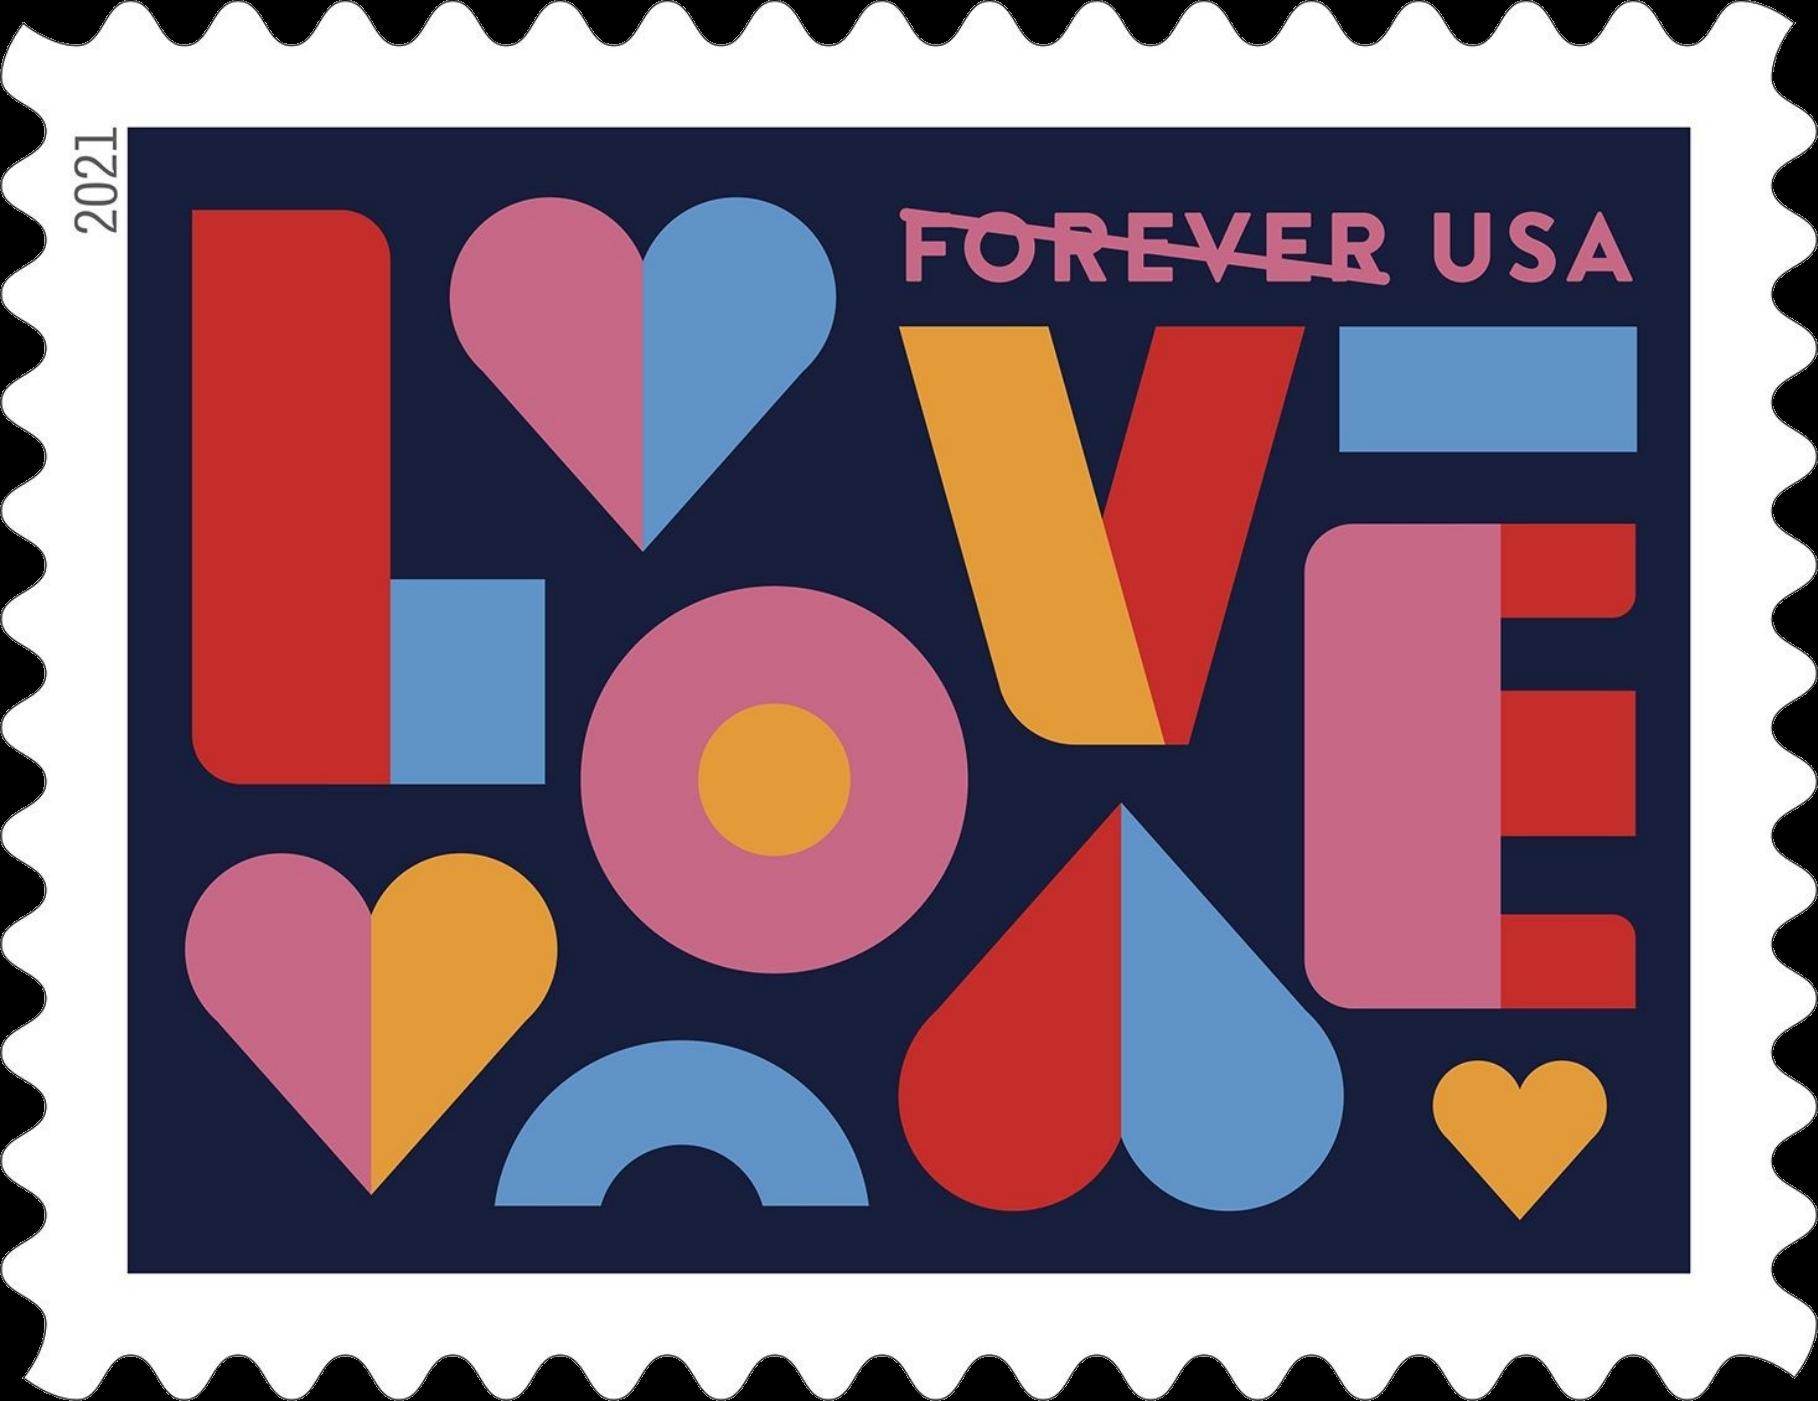 United States - Love, 14 January 2021